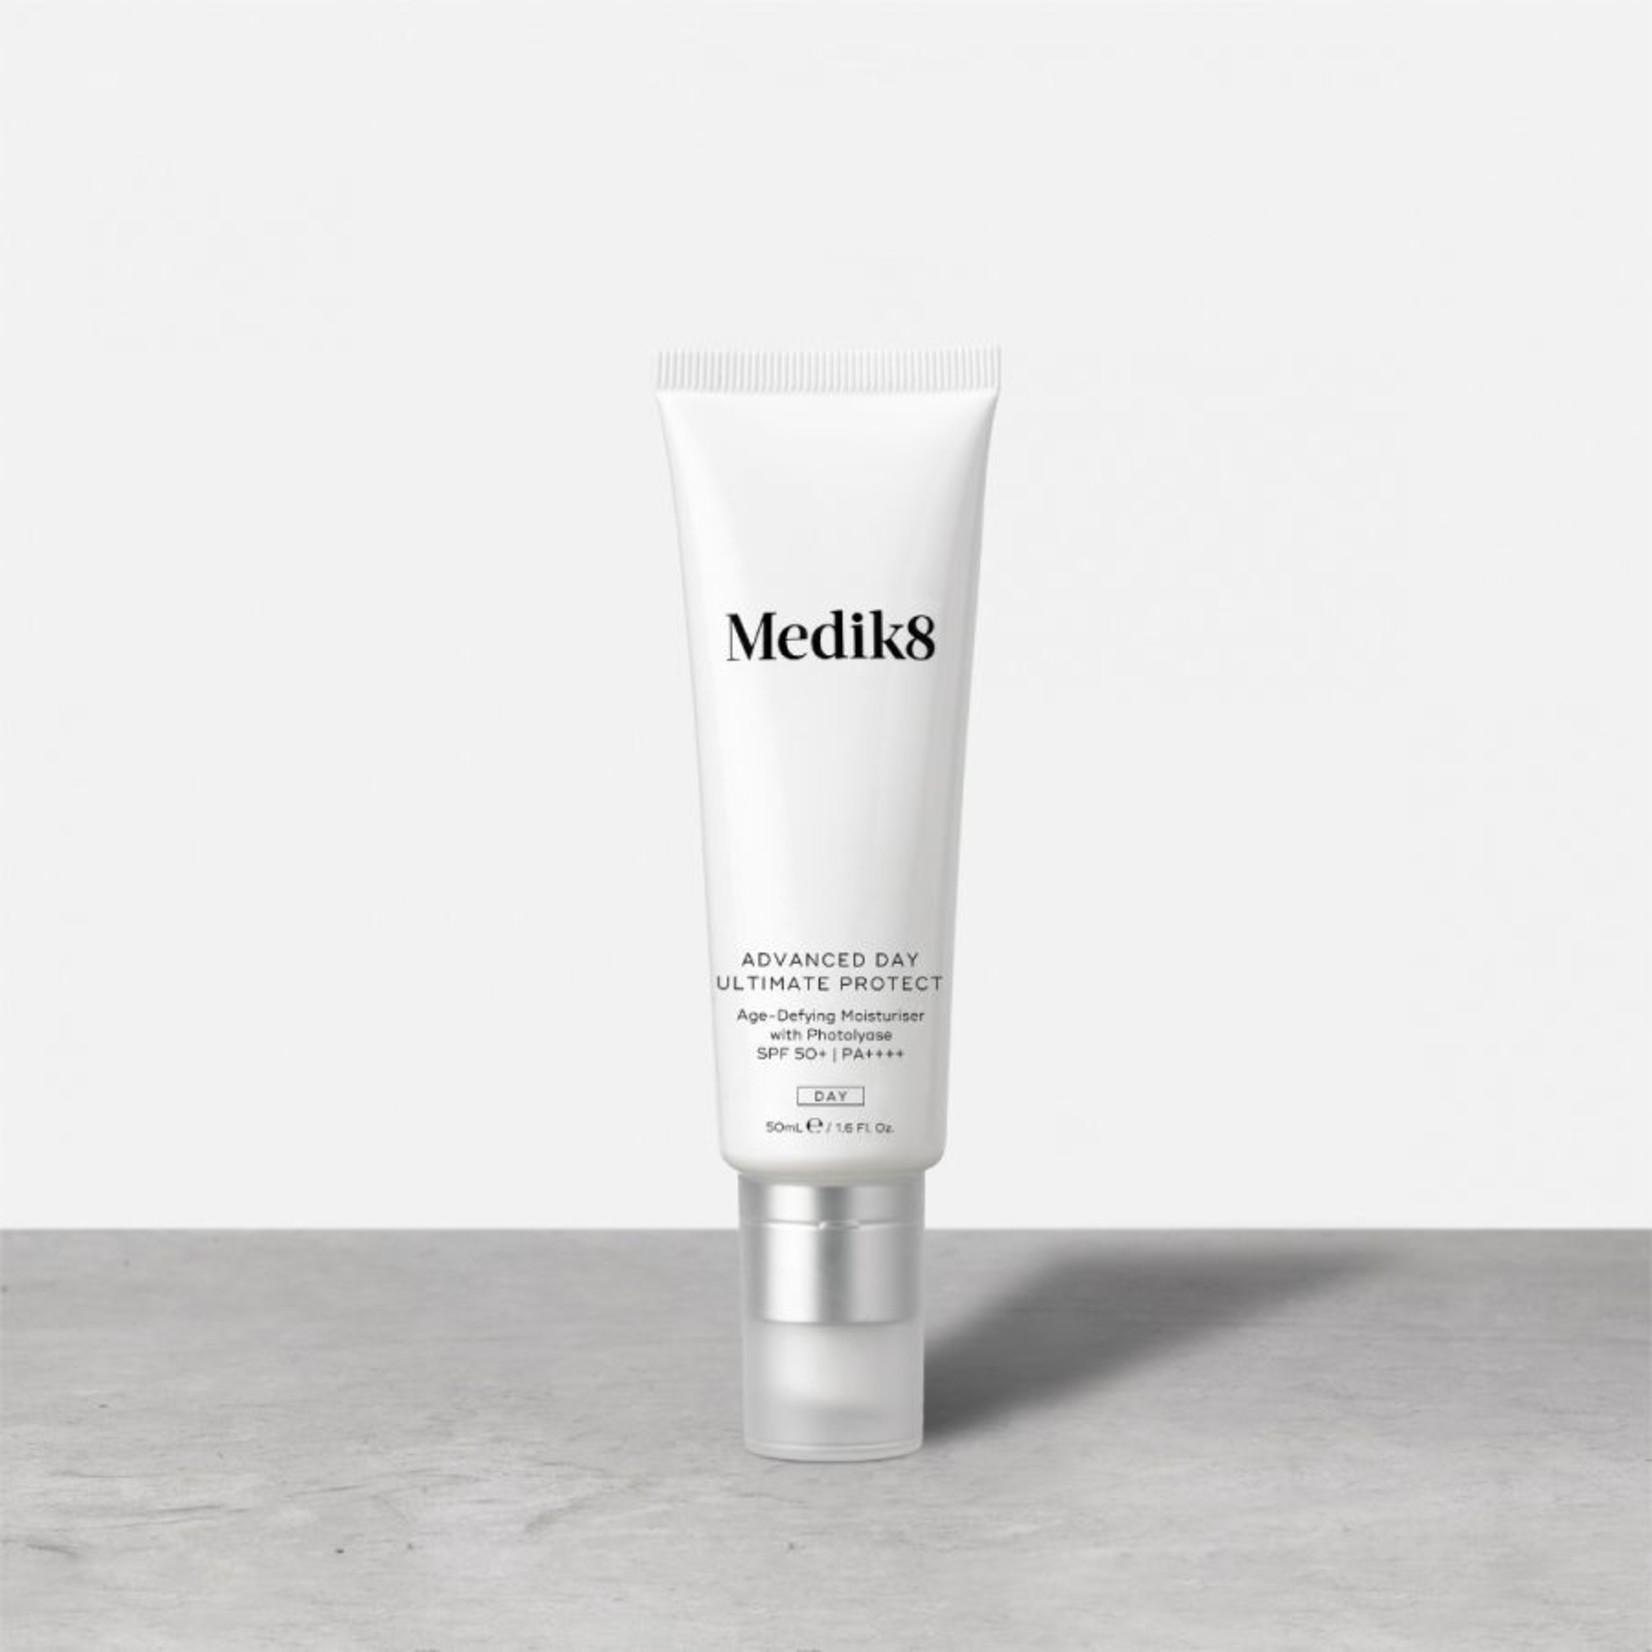 Medik8 Medik8 Advanced Day Ultimate Protect 50 ml